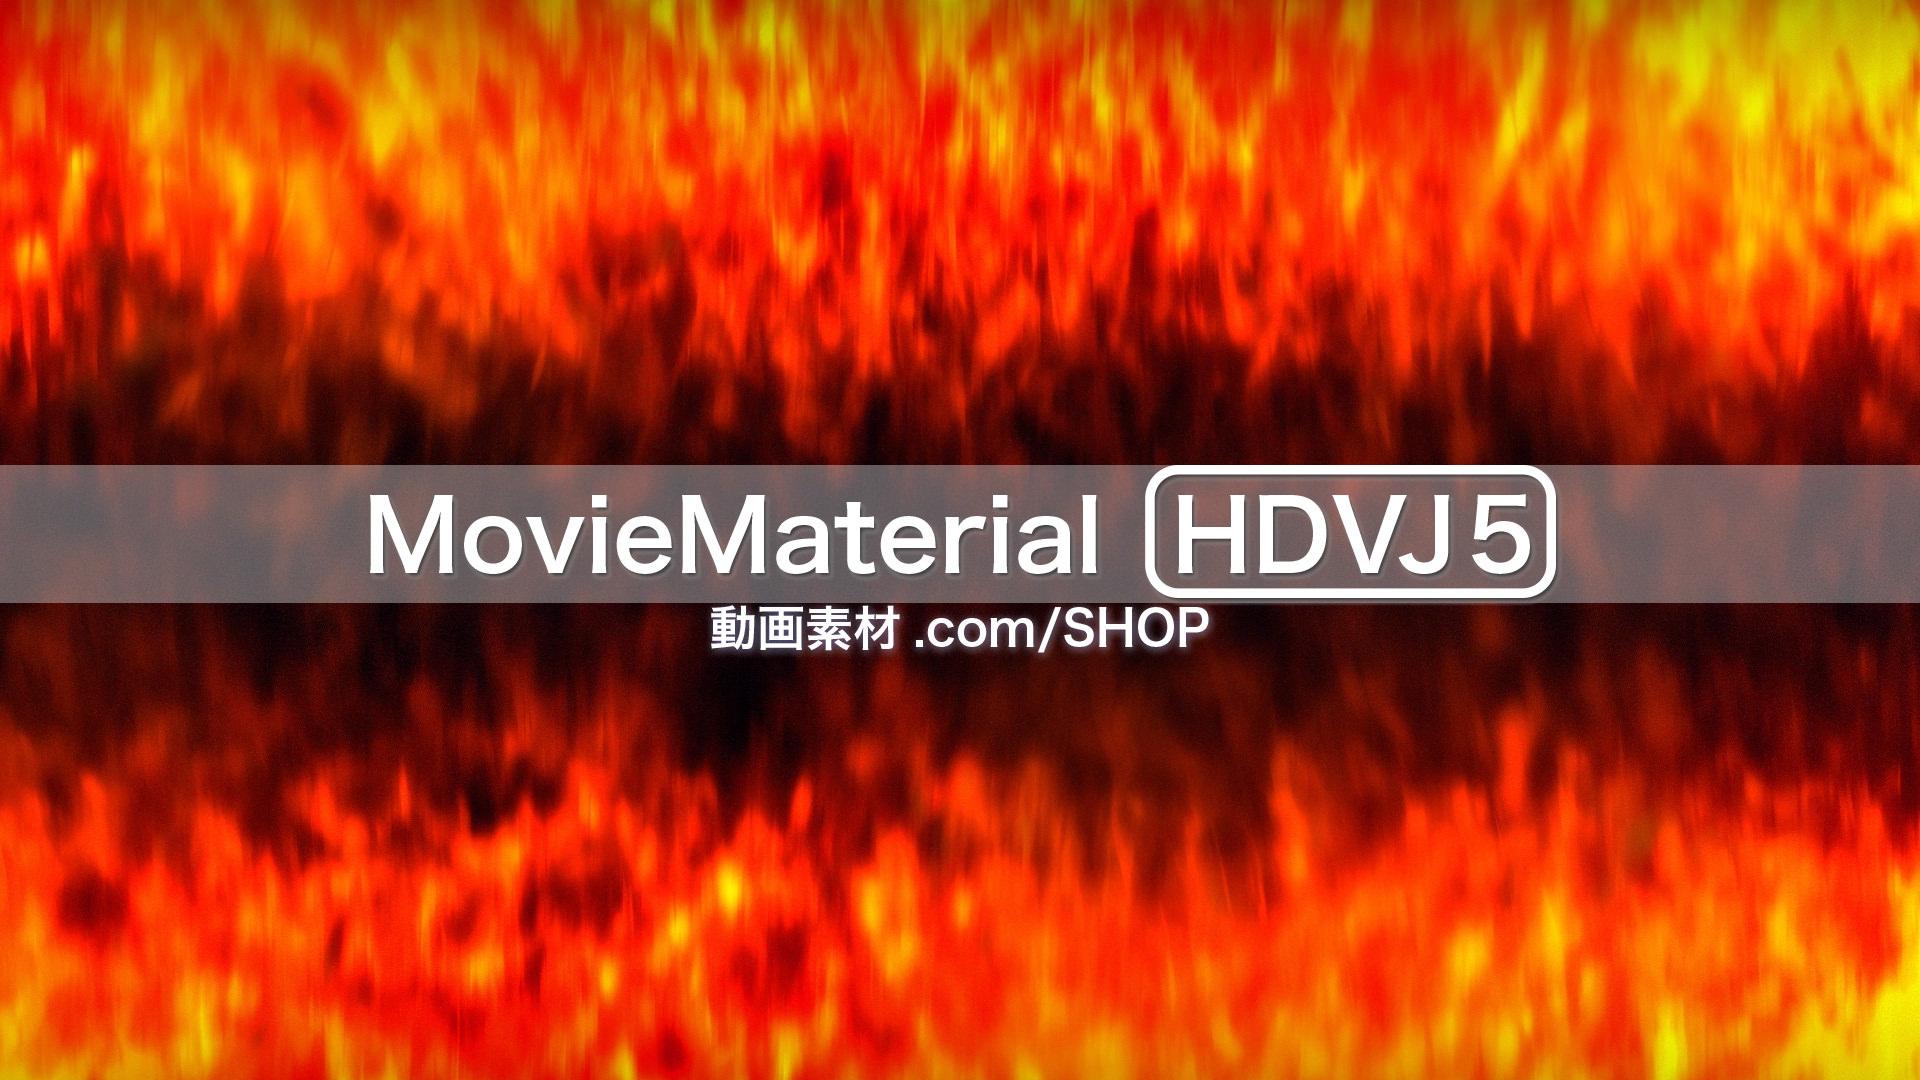 MovieMaterial HDVJ5 フルハイビジョンVJ動画素材集 画像1